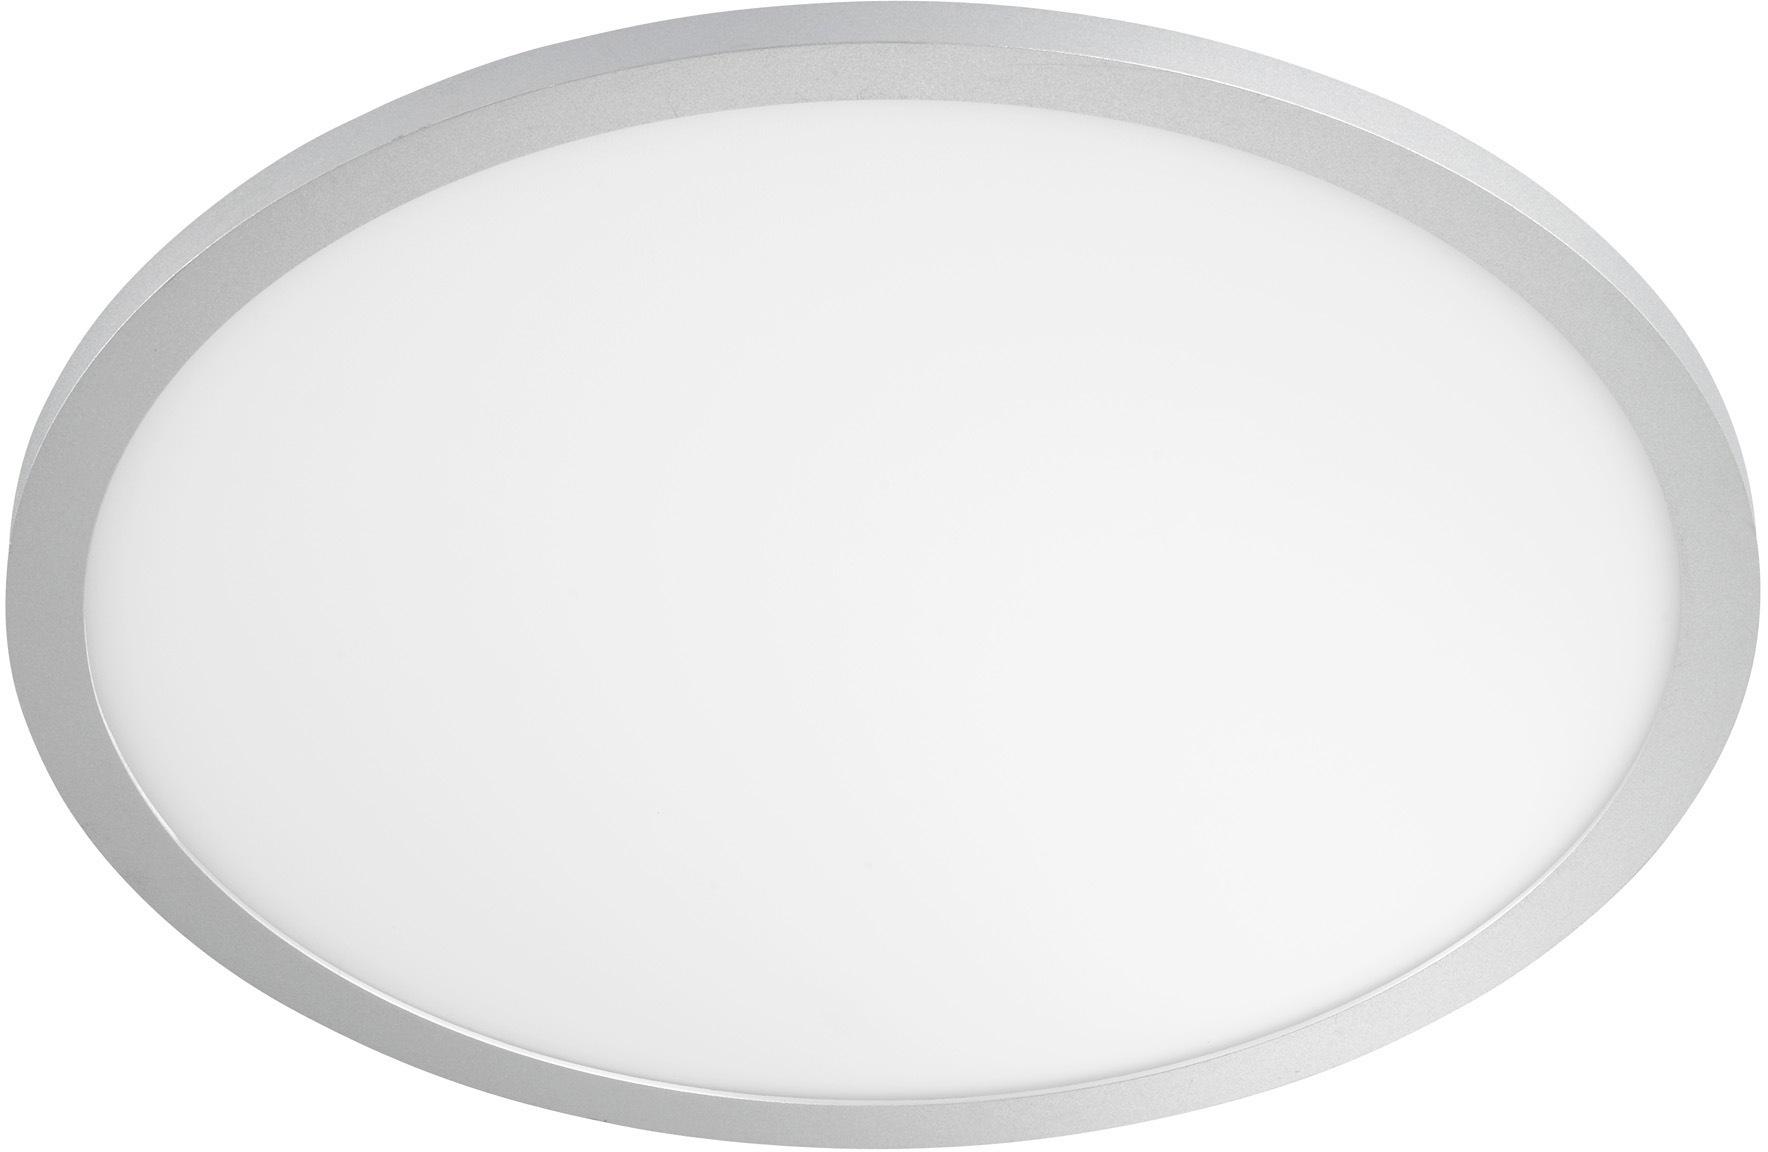 WOFI LED Deckenleuchte LINOX, LED-Board, Kaltweiß, dimmbar mittels Fernbedienung